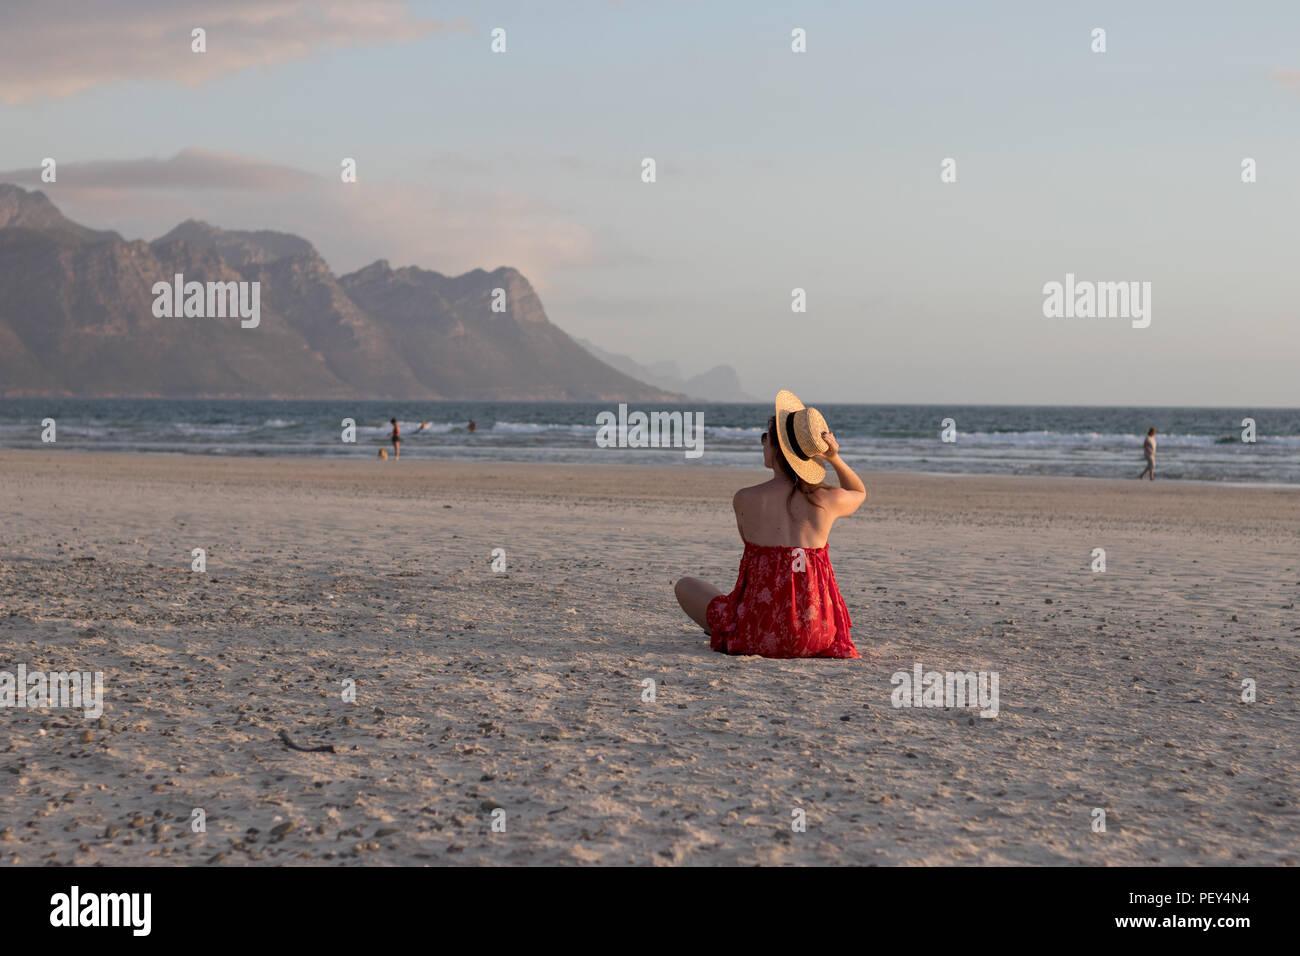 girl with red dress at beach sitting with sun hat, frau sitzt am strand mit rotem kleid und sonnehut, bergkulisse, mountain viw, pastell - Stock Image